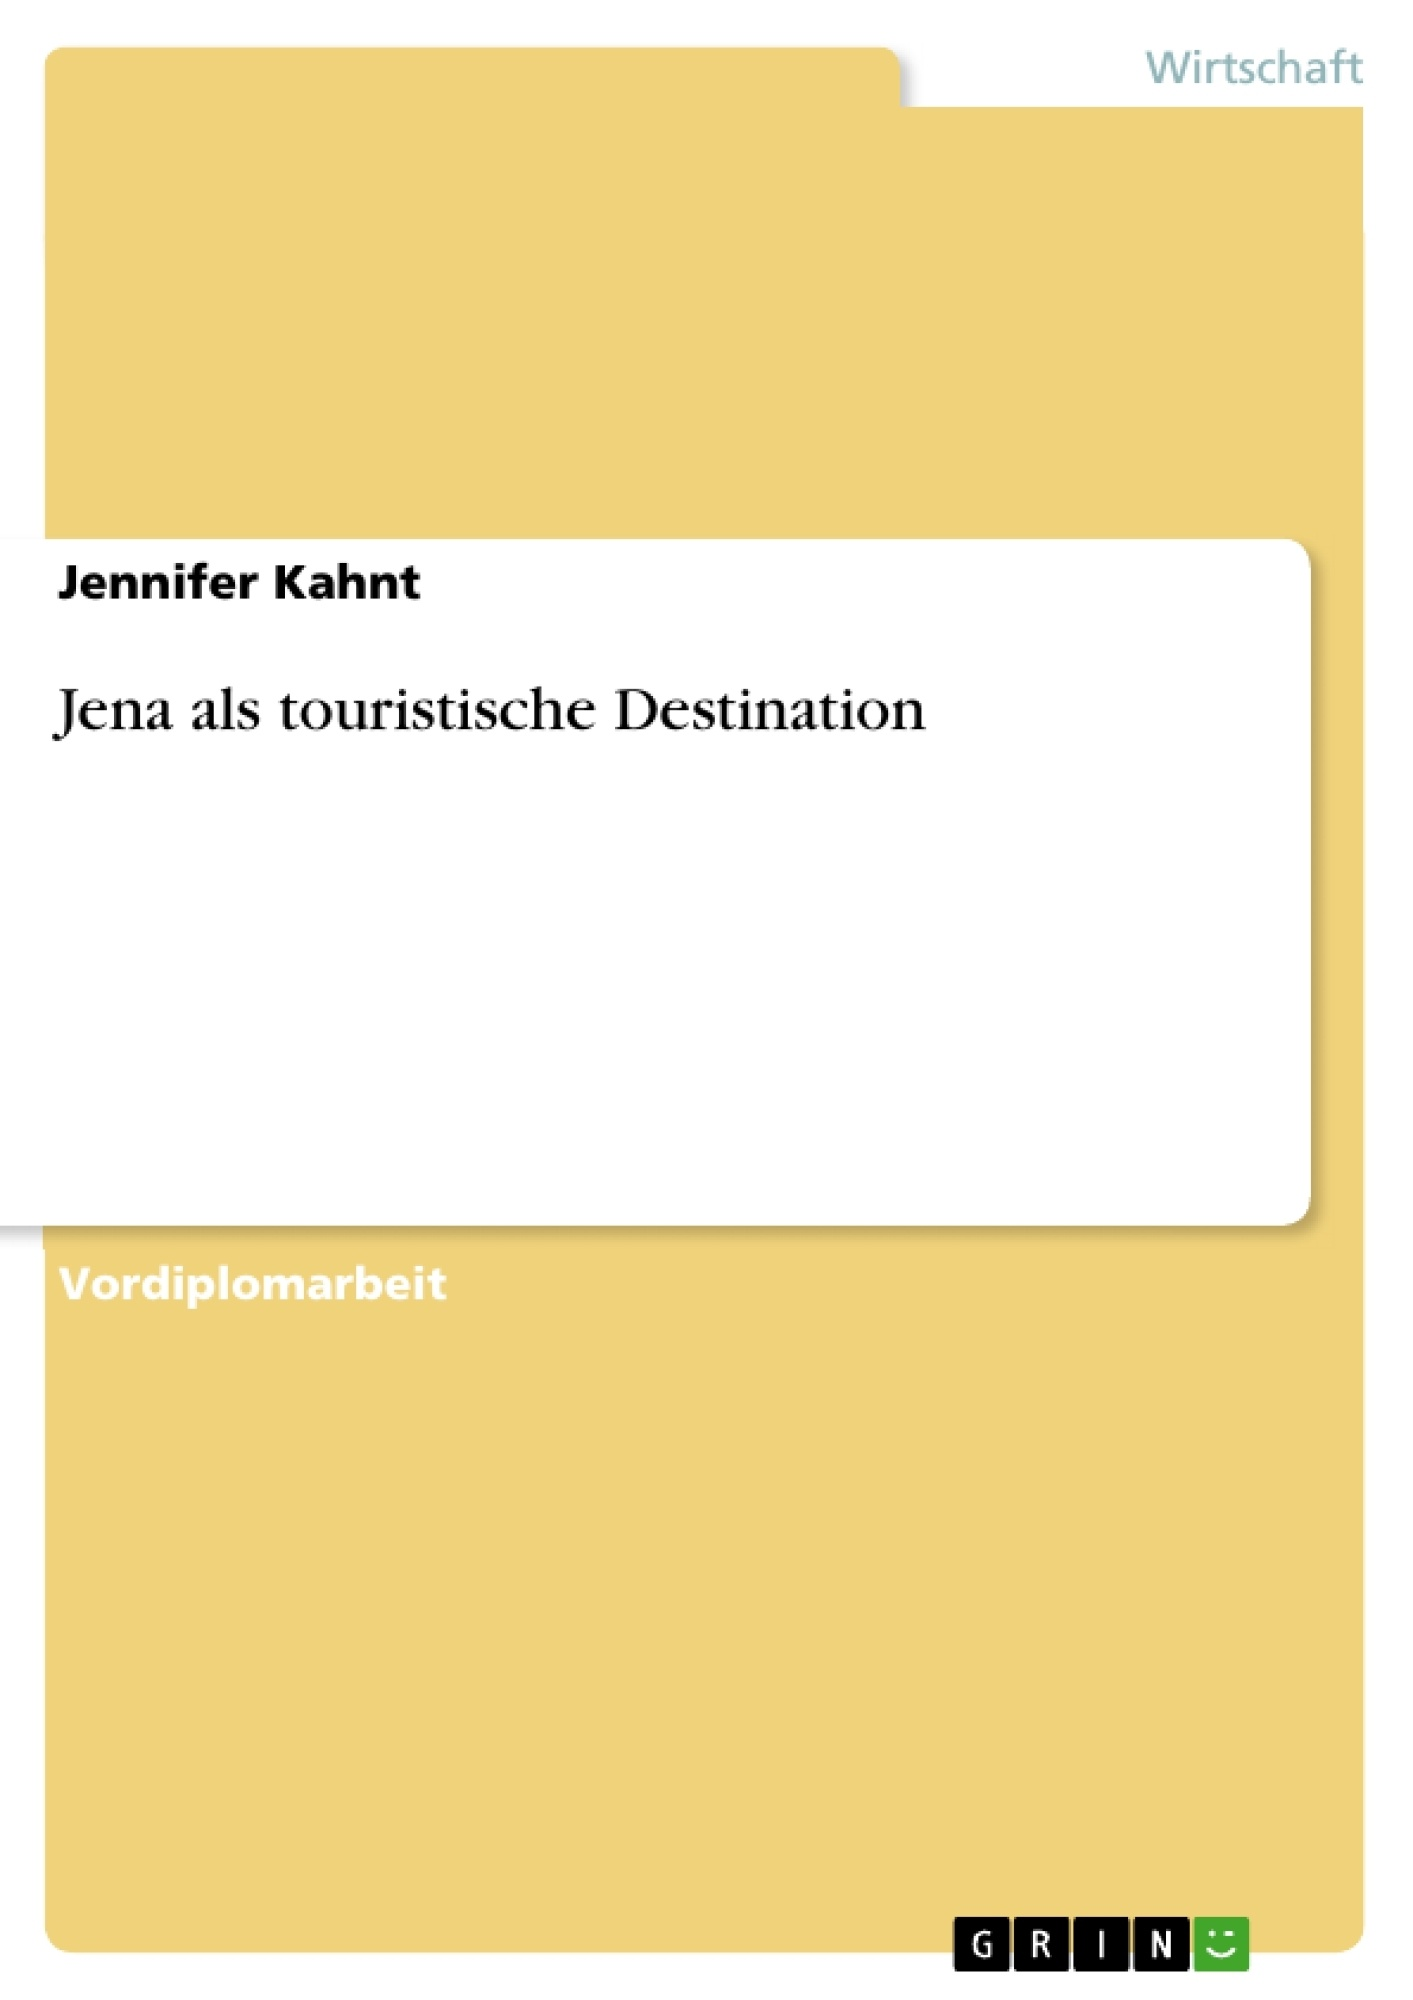 Titel: Jena als touristische Destination